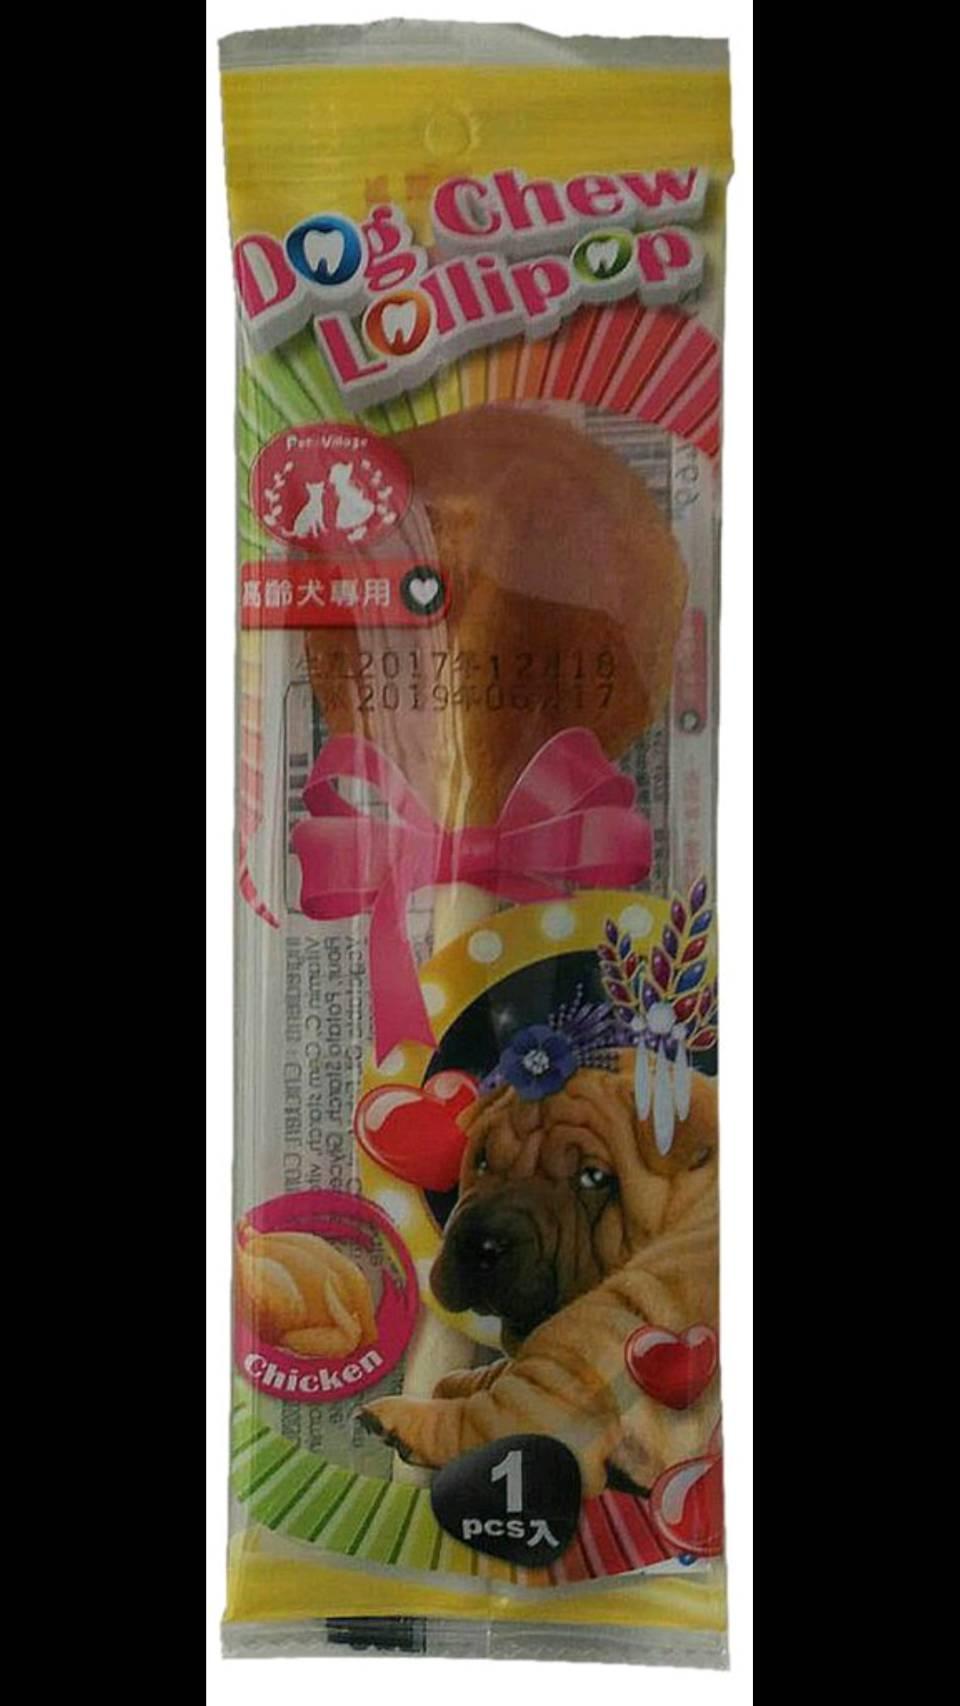 PV明星Q嚼雞肉棒棒糖 Pet Village 魔法村 高齡犬專用